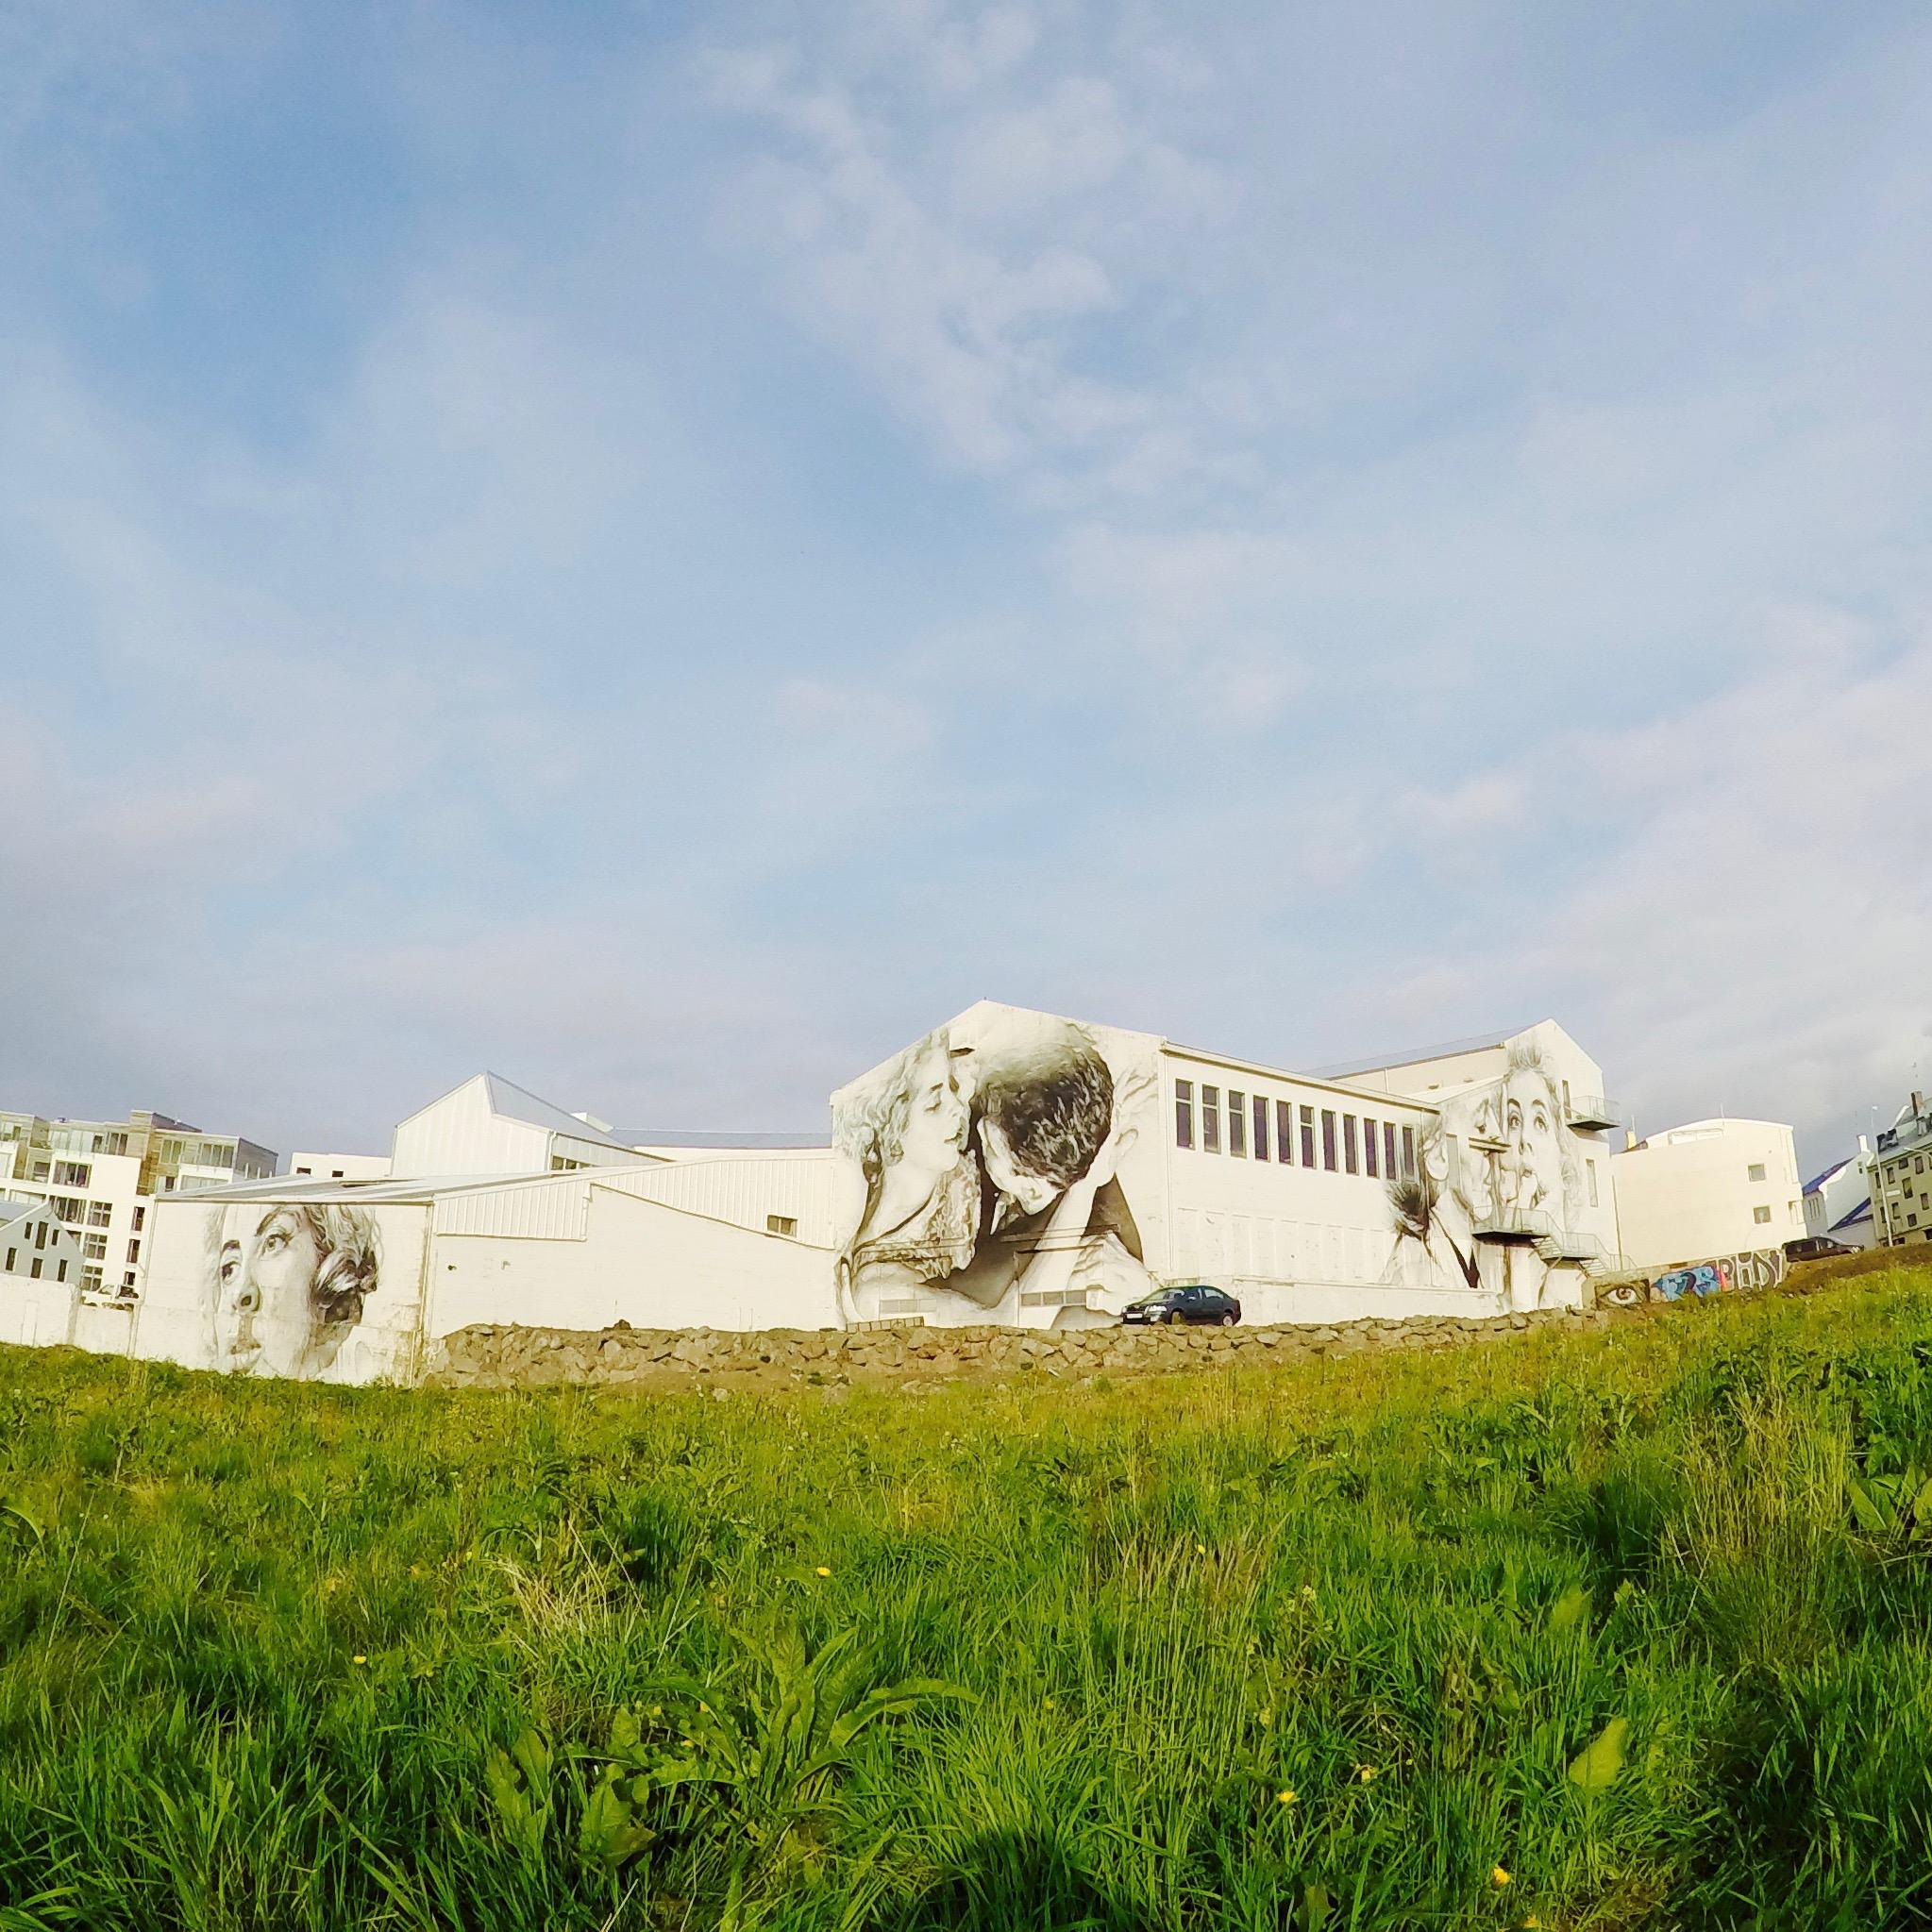 iceland-reykjavik-steet-art.jpg